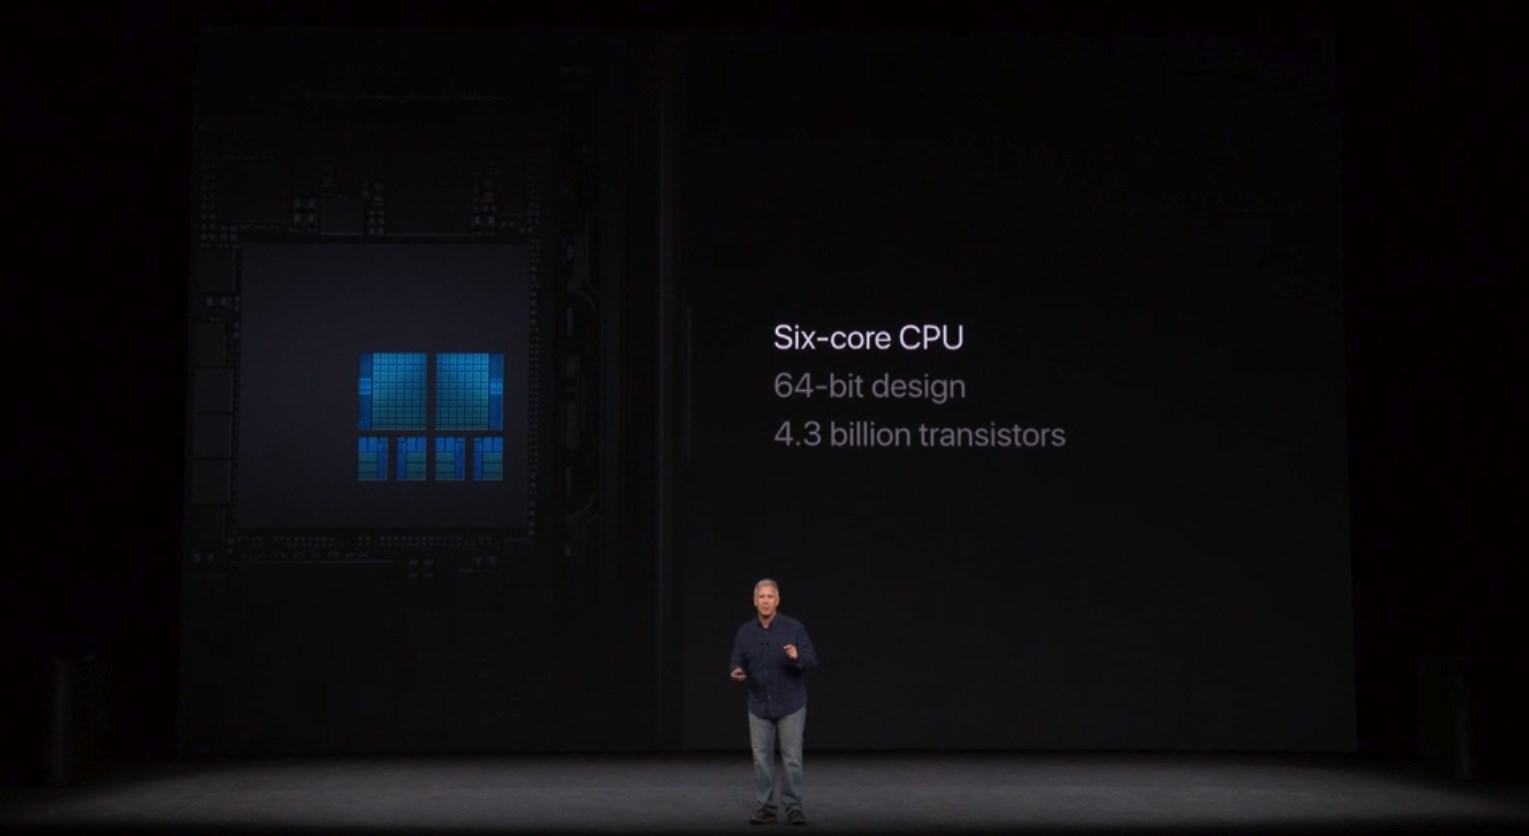 iPhone 8 Plus A11 Bionic